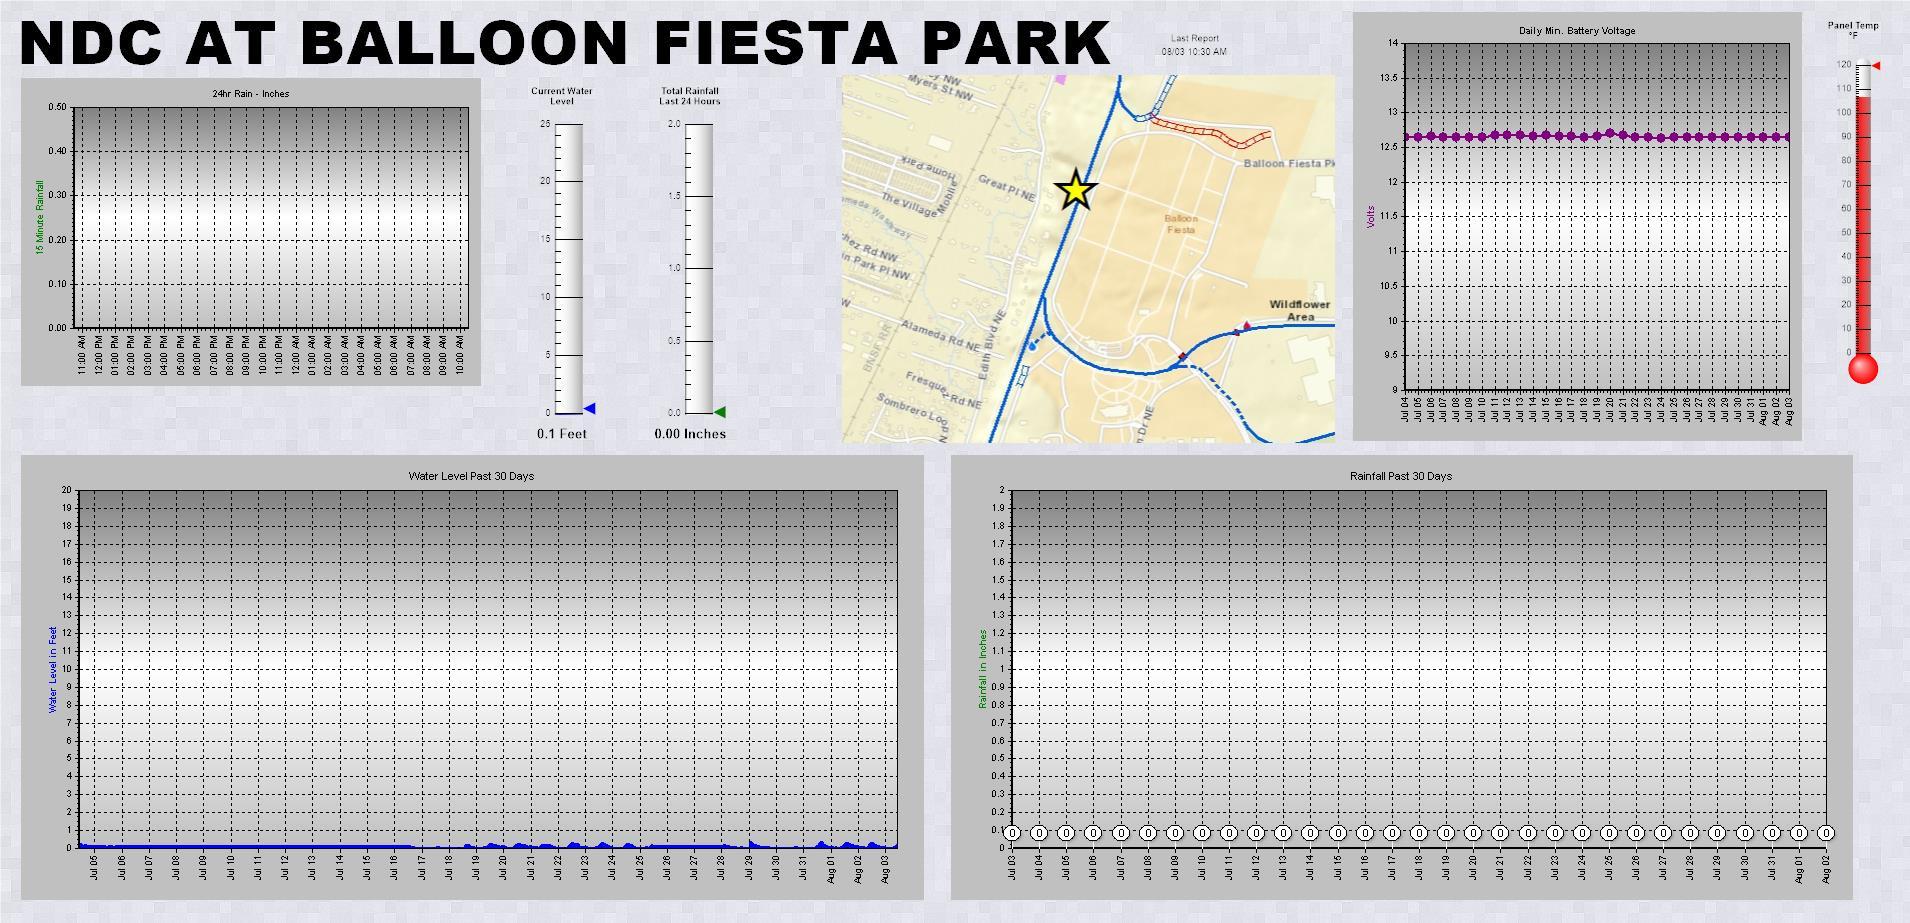 North Diversion Channel at Balloon Fiesta Park telemetry data